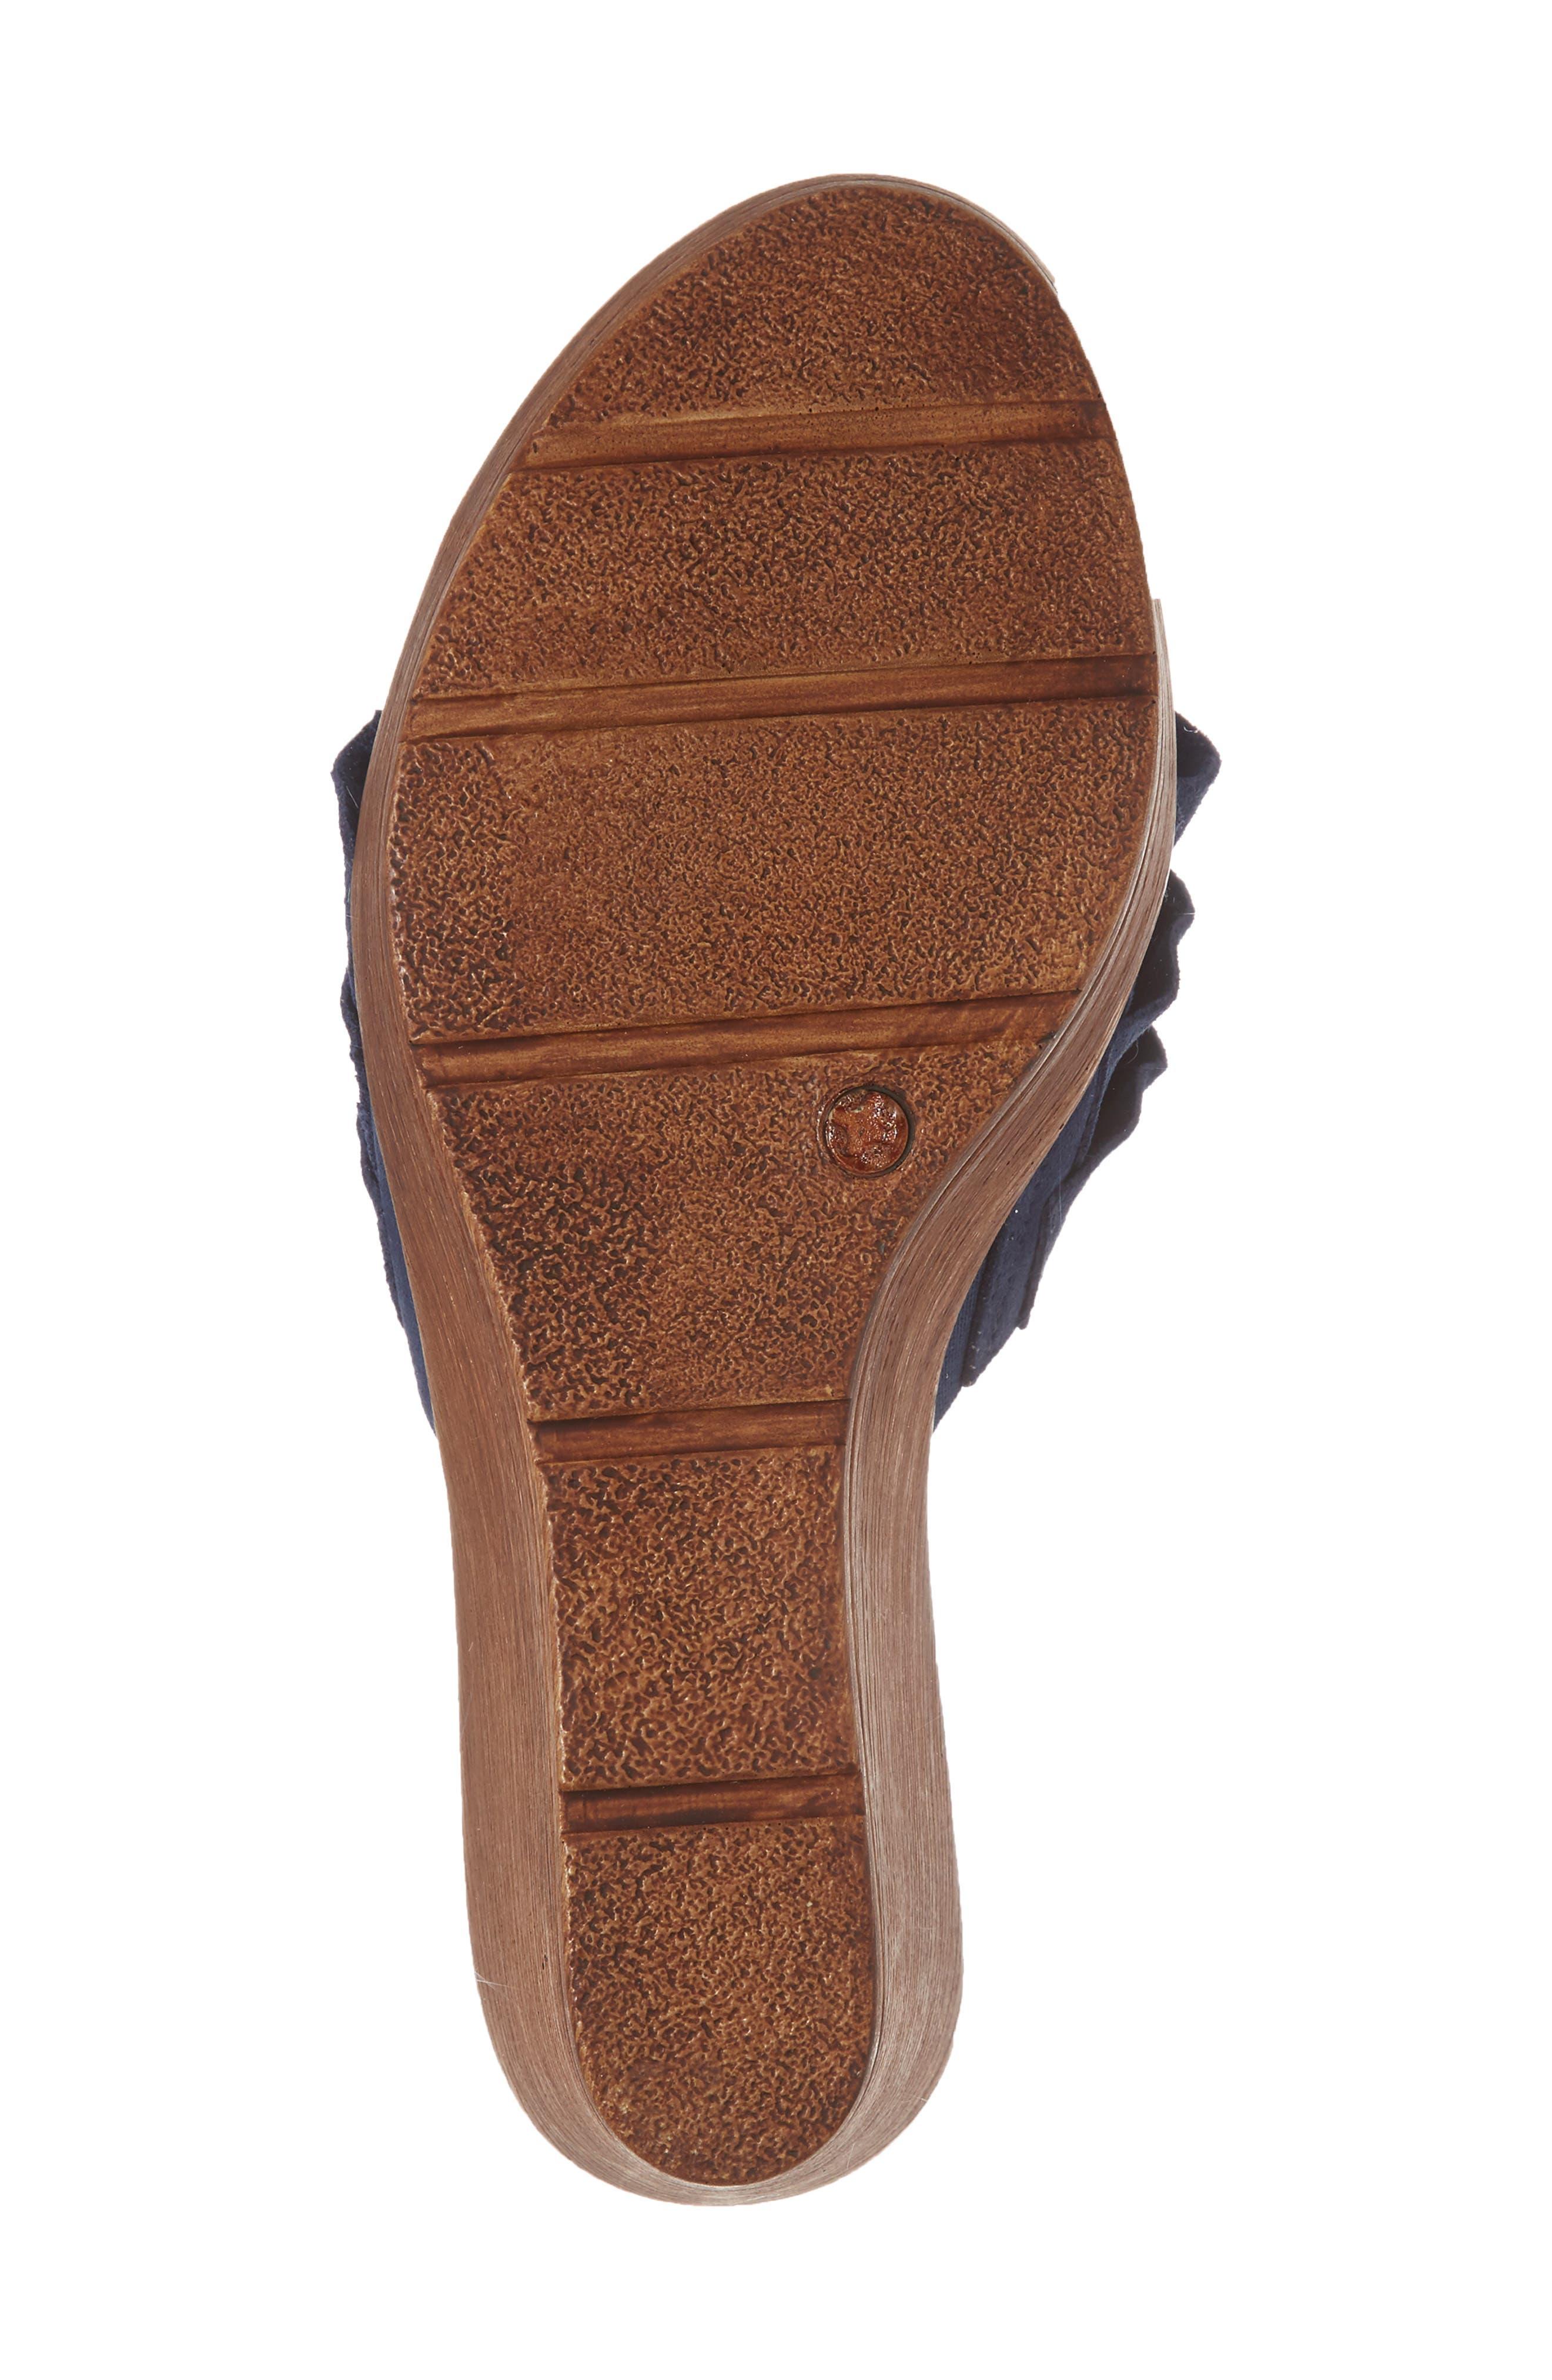 Bey Platform Wedge Sandal,                             Alternate thumbnail 6, color,                             NAVY SUEDE